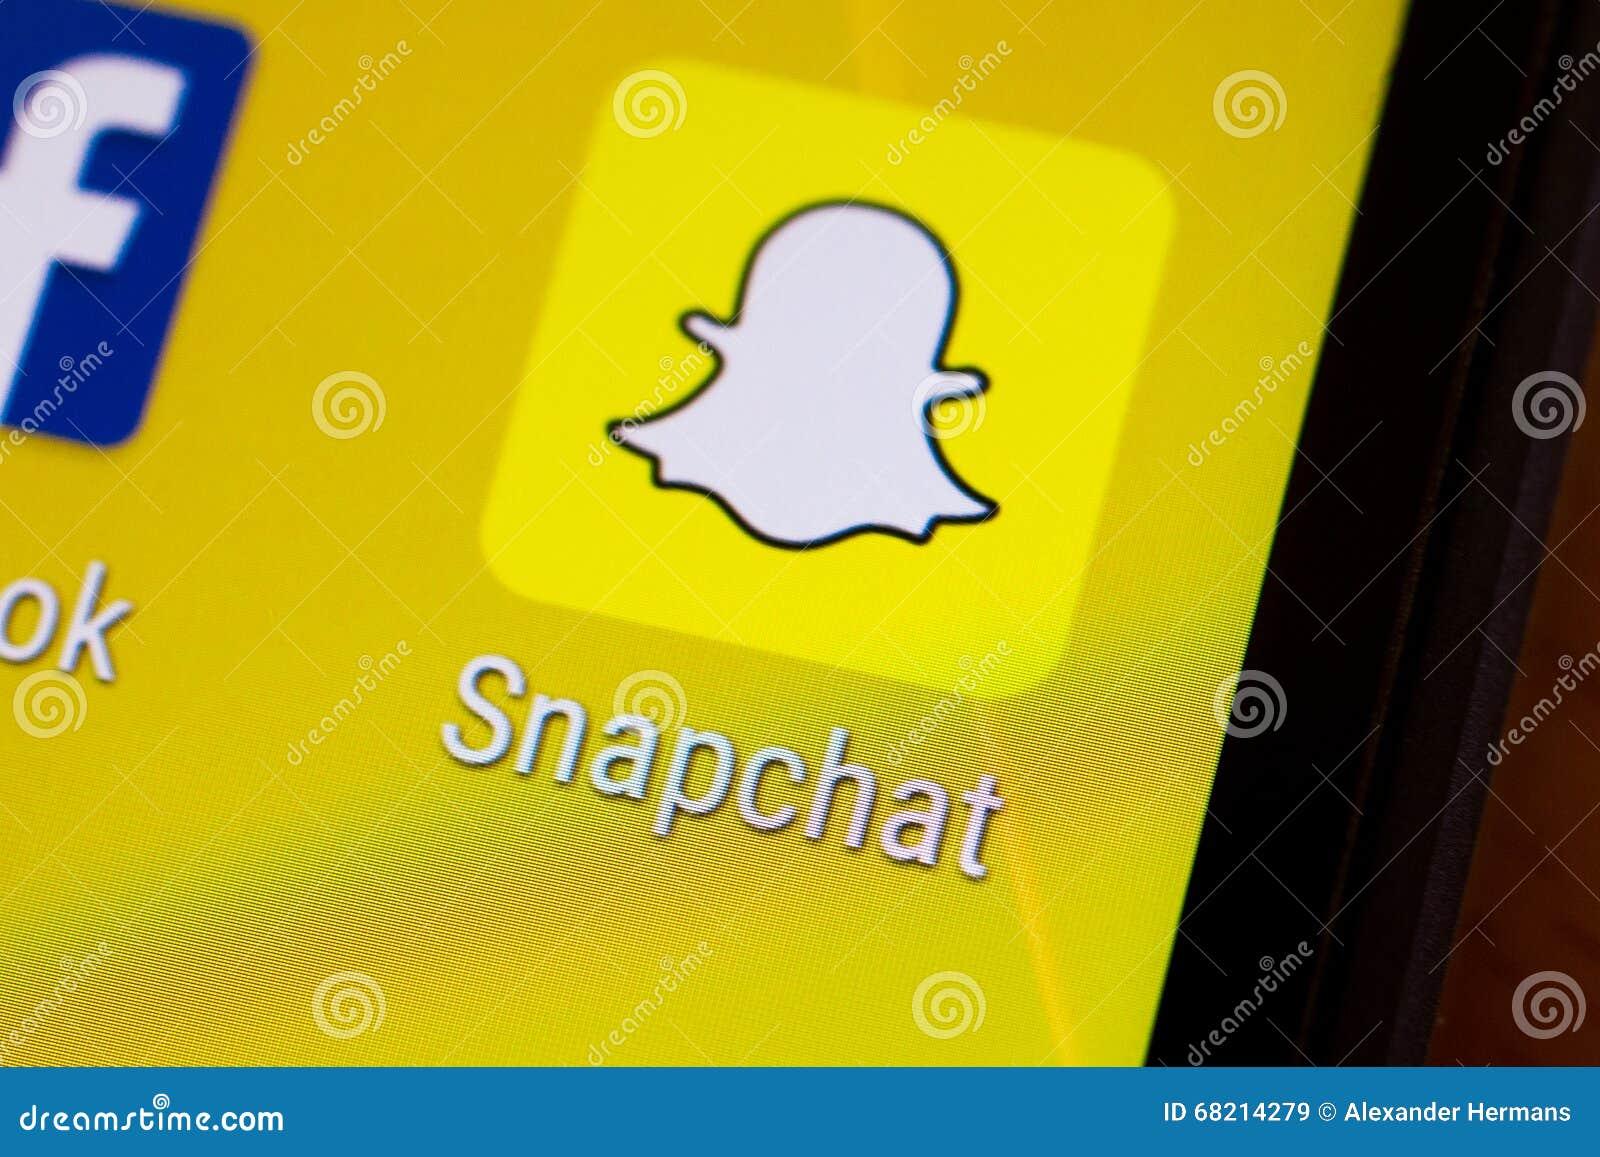 Snapchat application thumbnail logo on an android smartphone